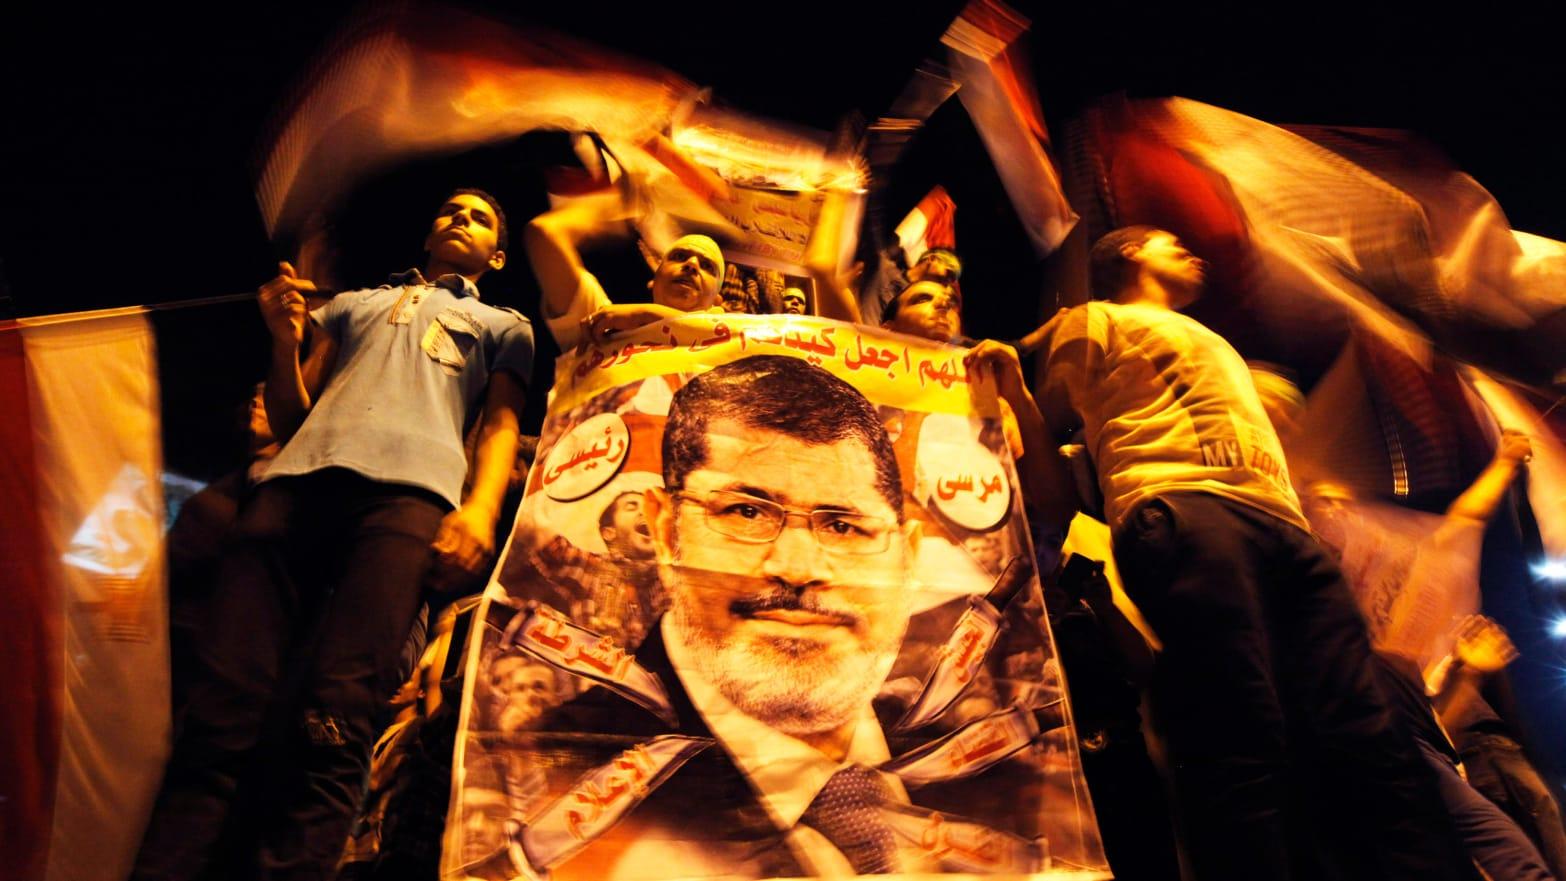 How did the Muslim Brotherhood Fall So Far, So Fast?